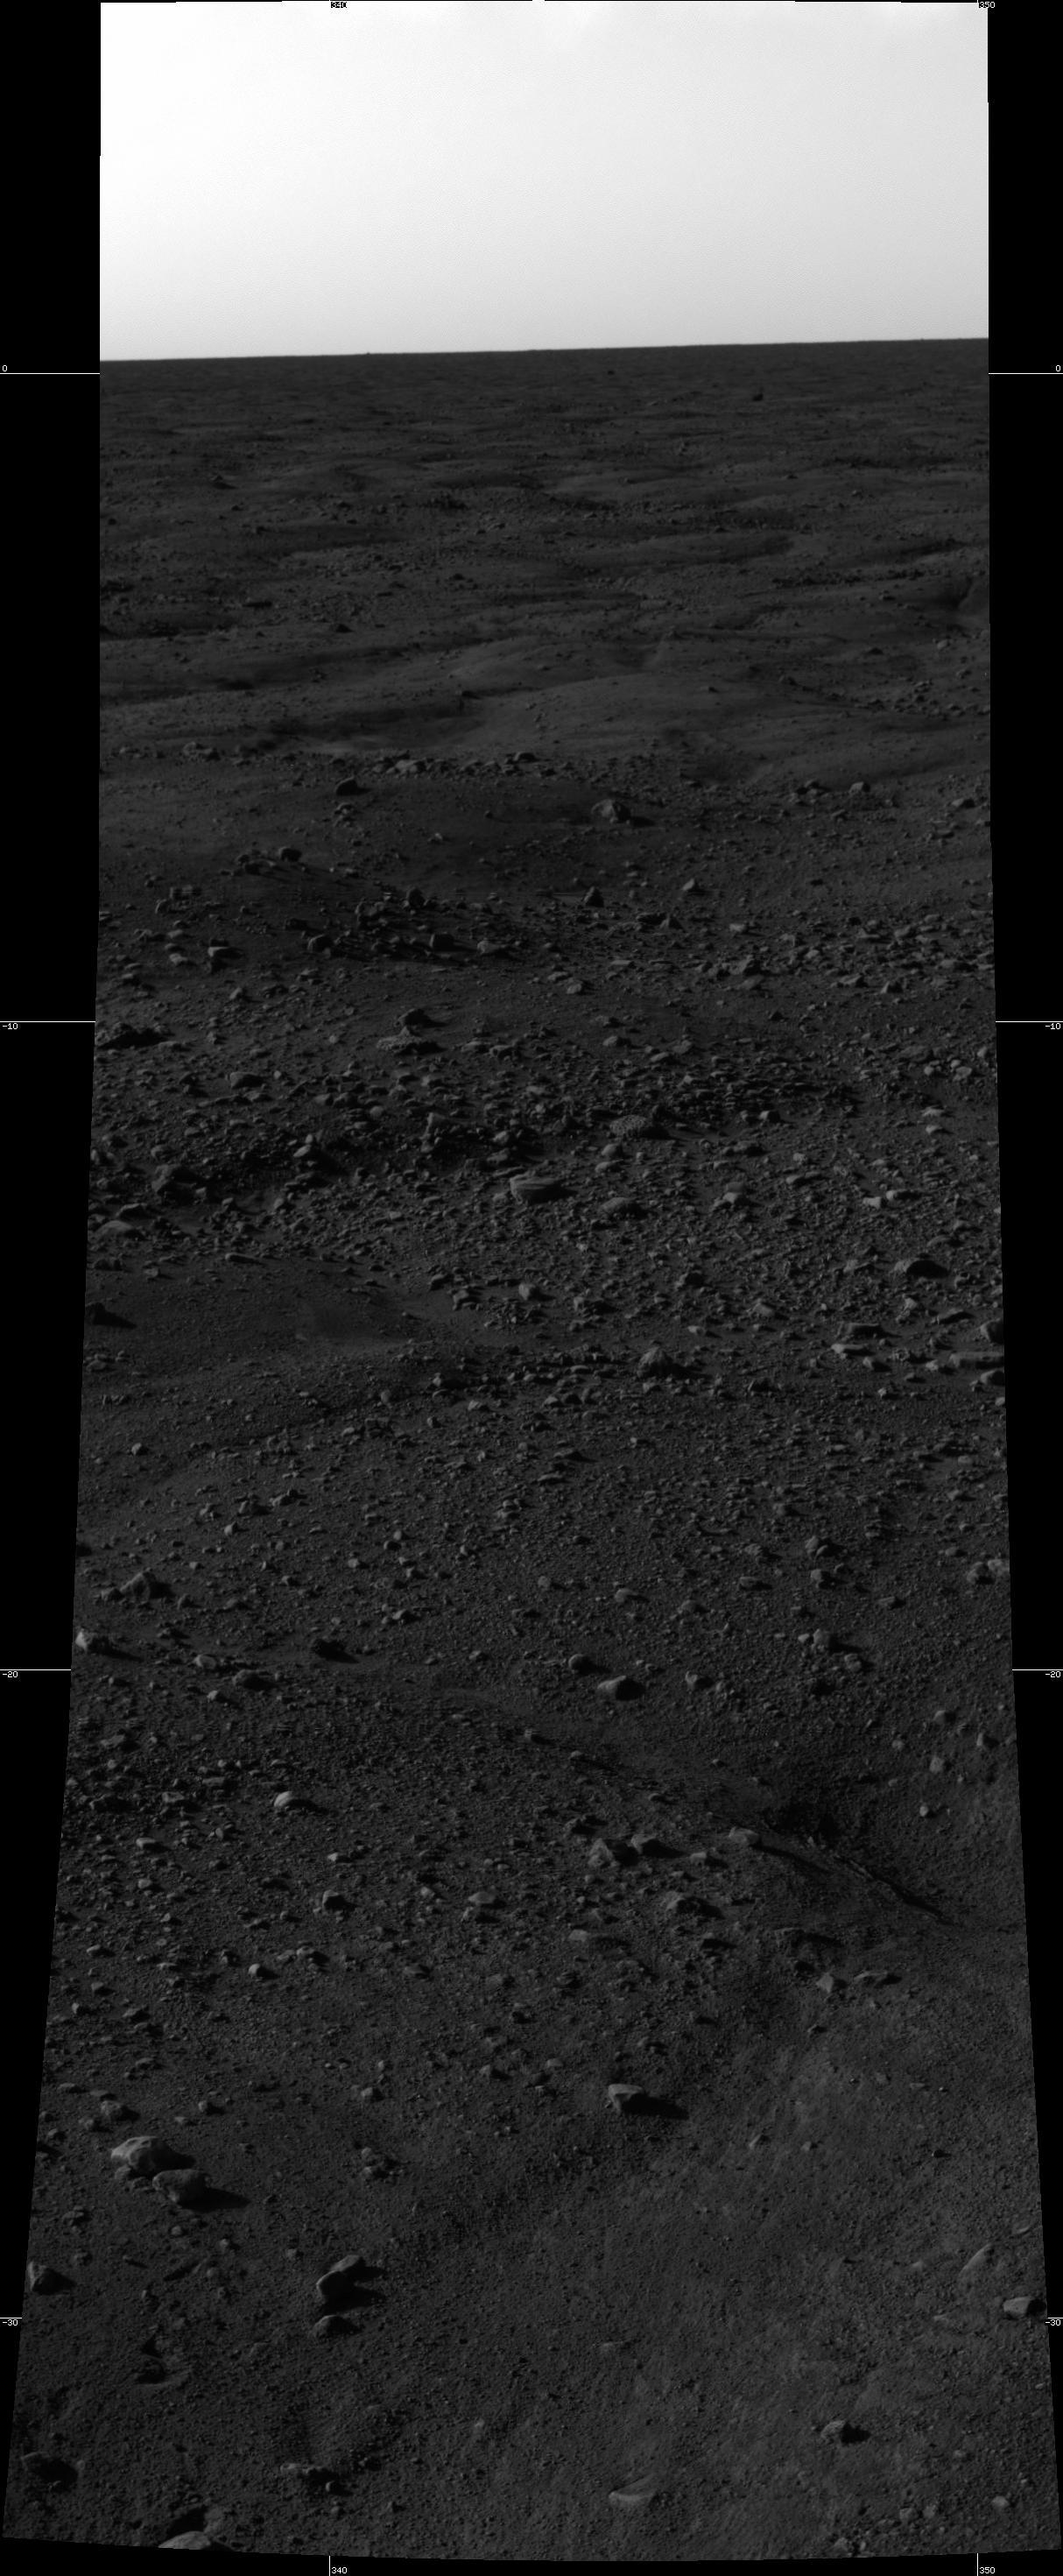 http://spaceflightnow.com/mars/phoenix/images/lg_331.jpg